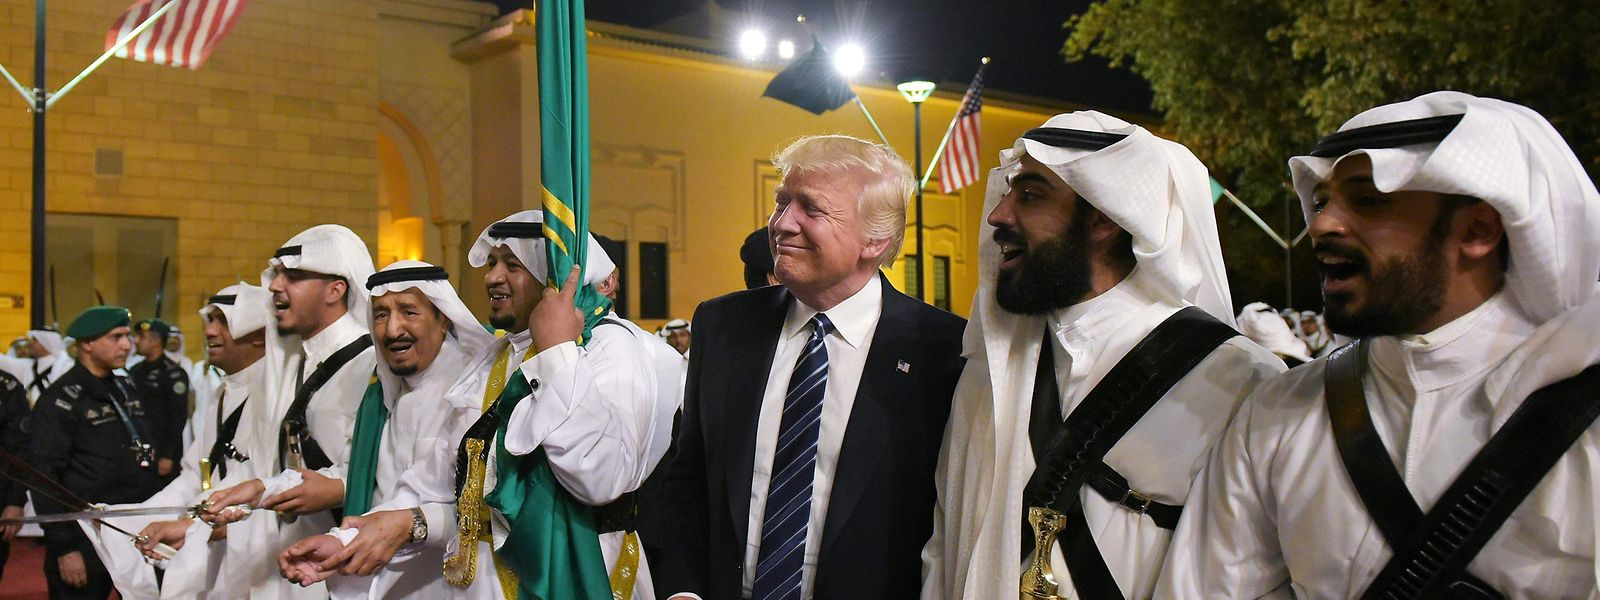 US-Präsident Donald Trump bei seinem Besuch in Saudi-Arabien im Mai 2017.